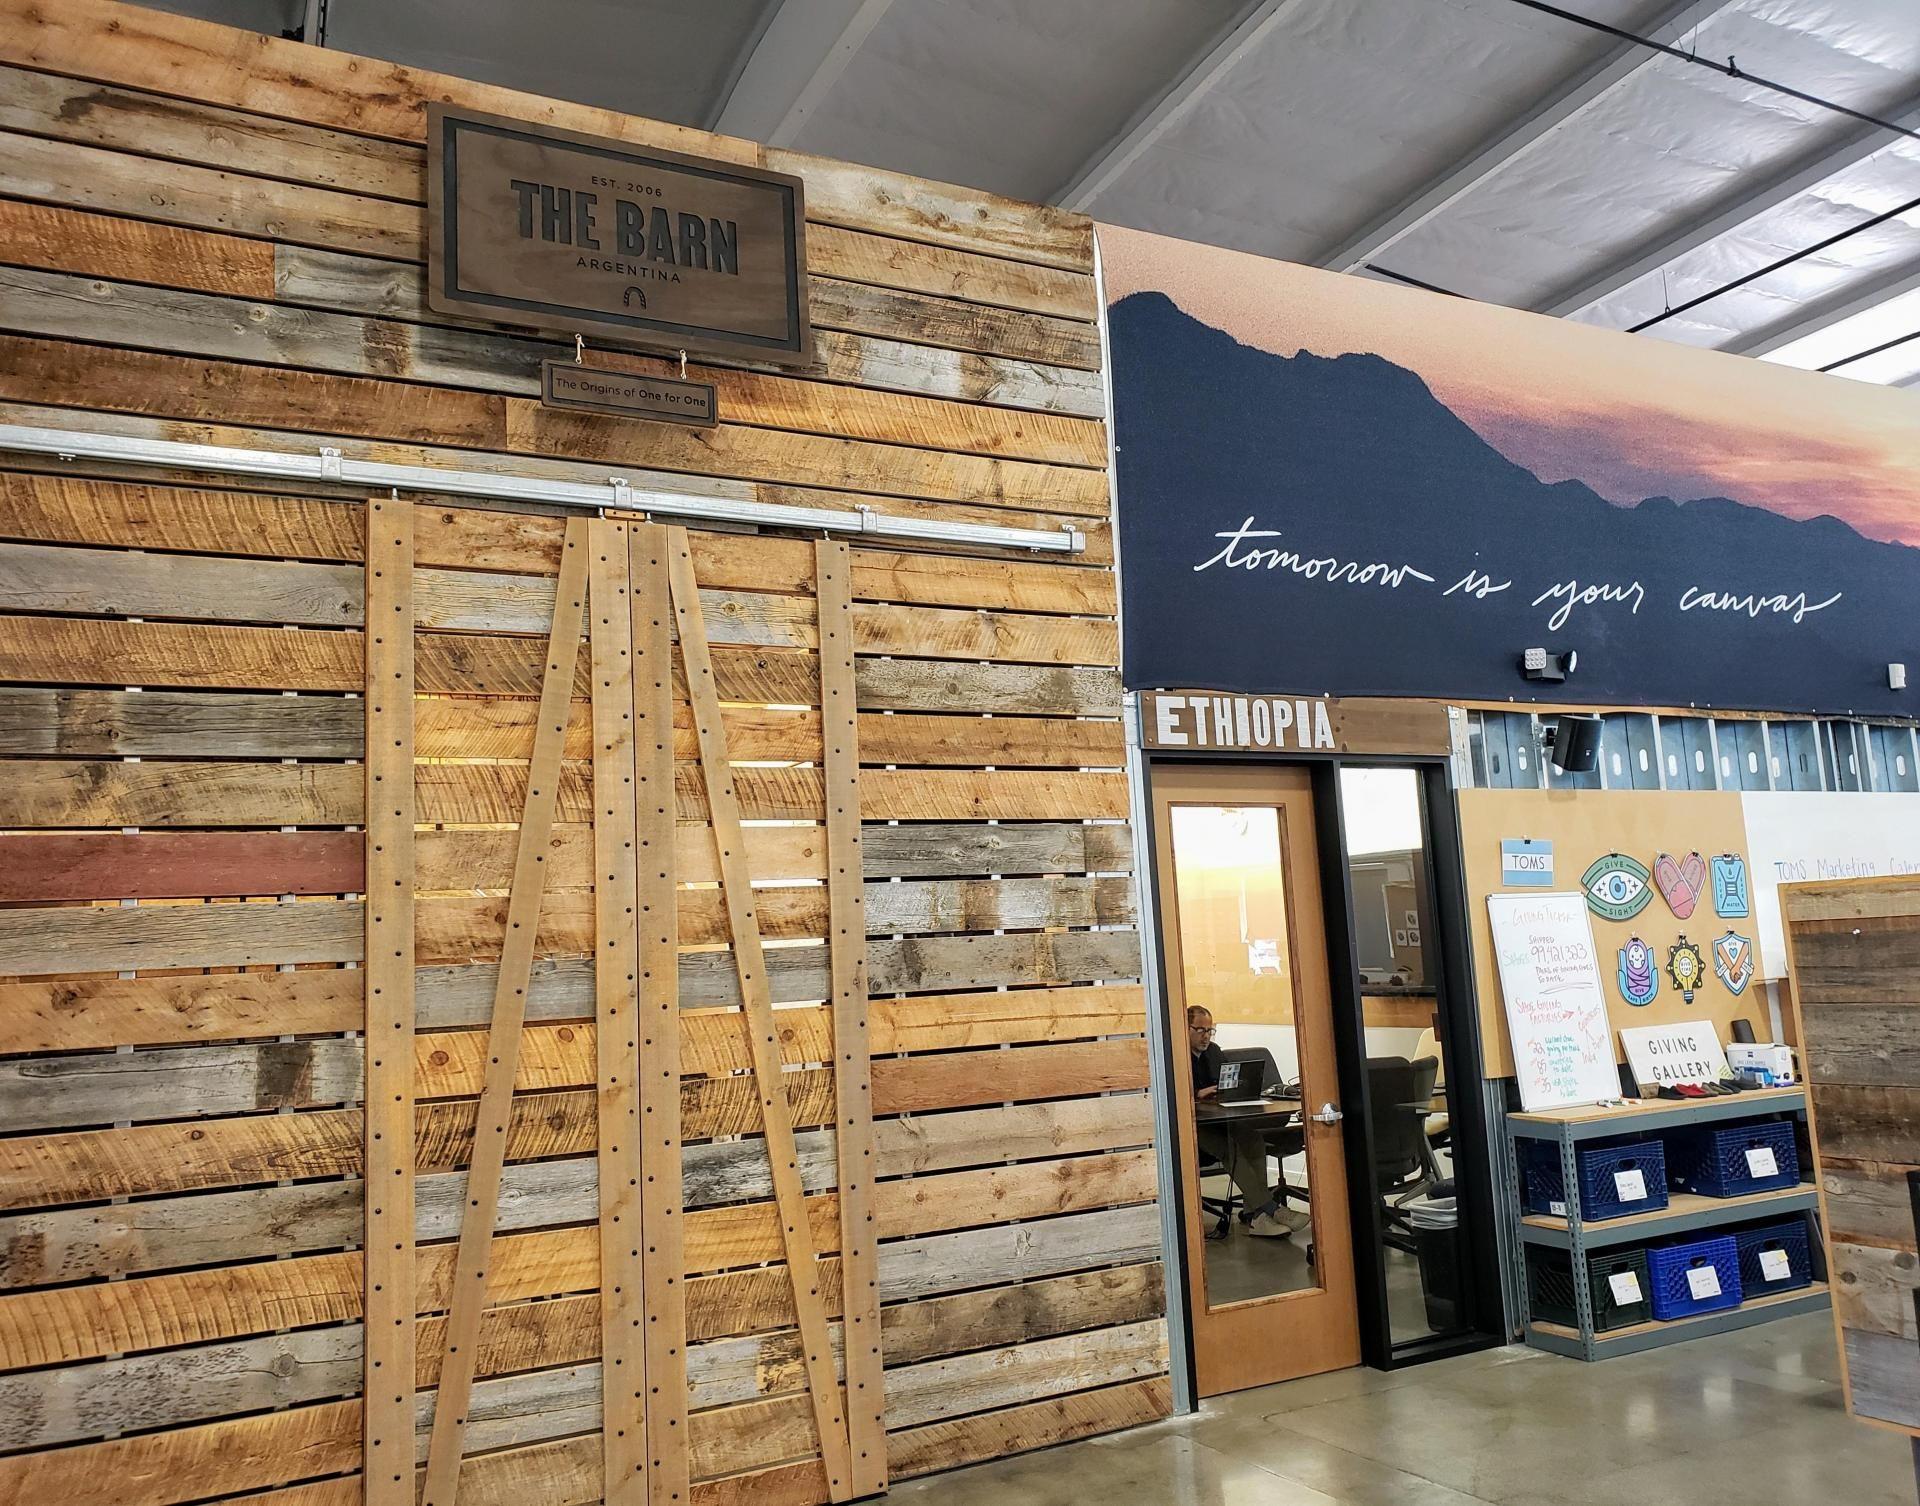 Toms creative office in Playa Vista